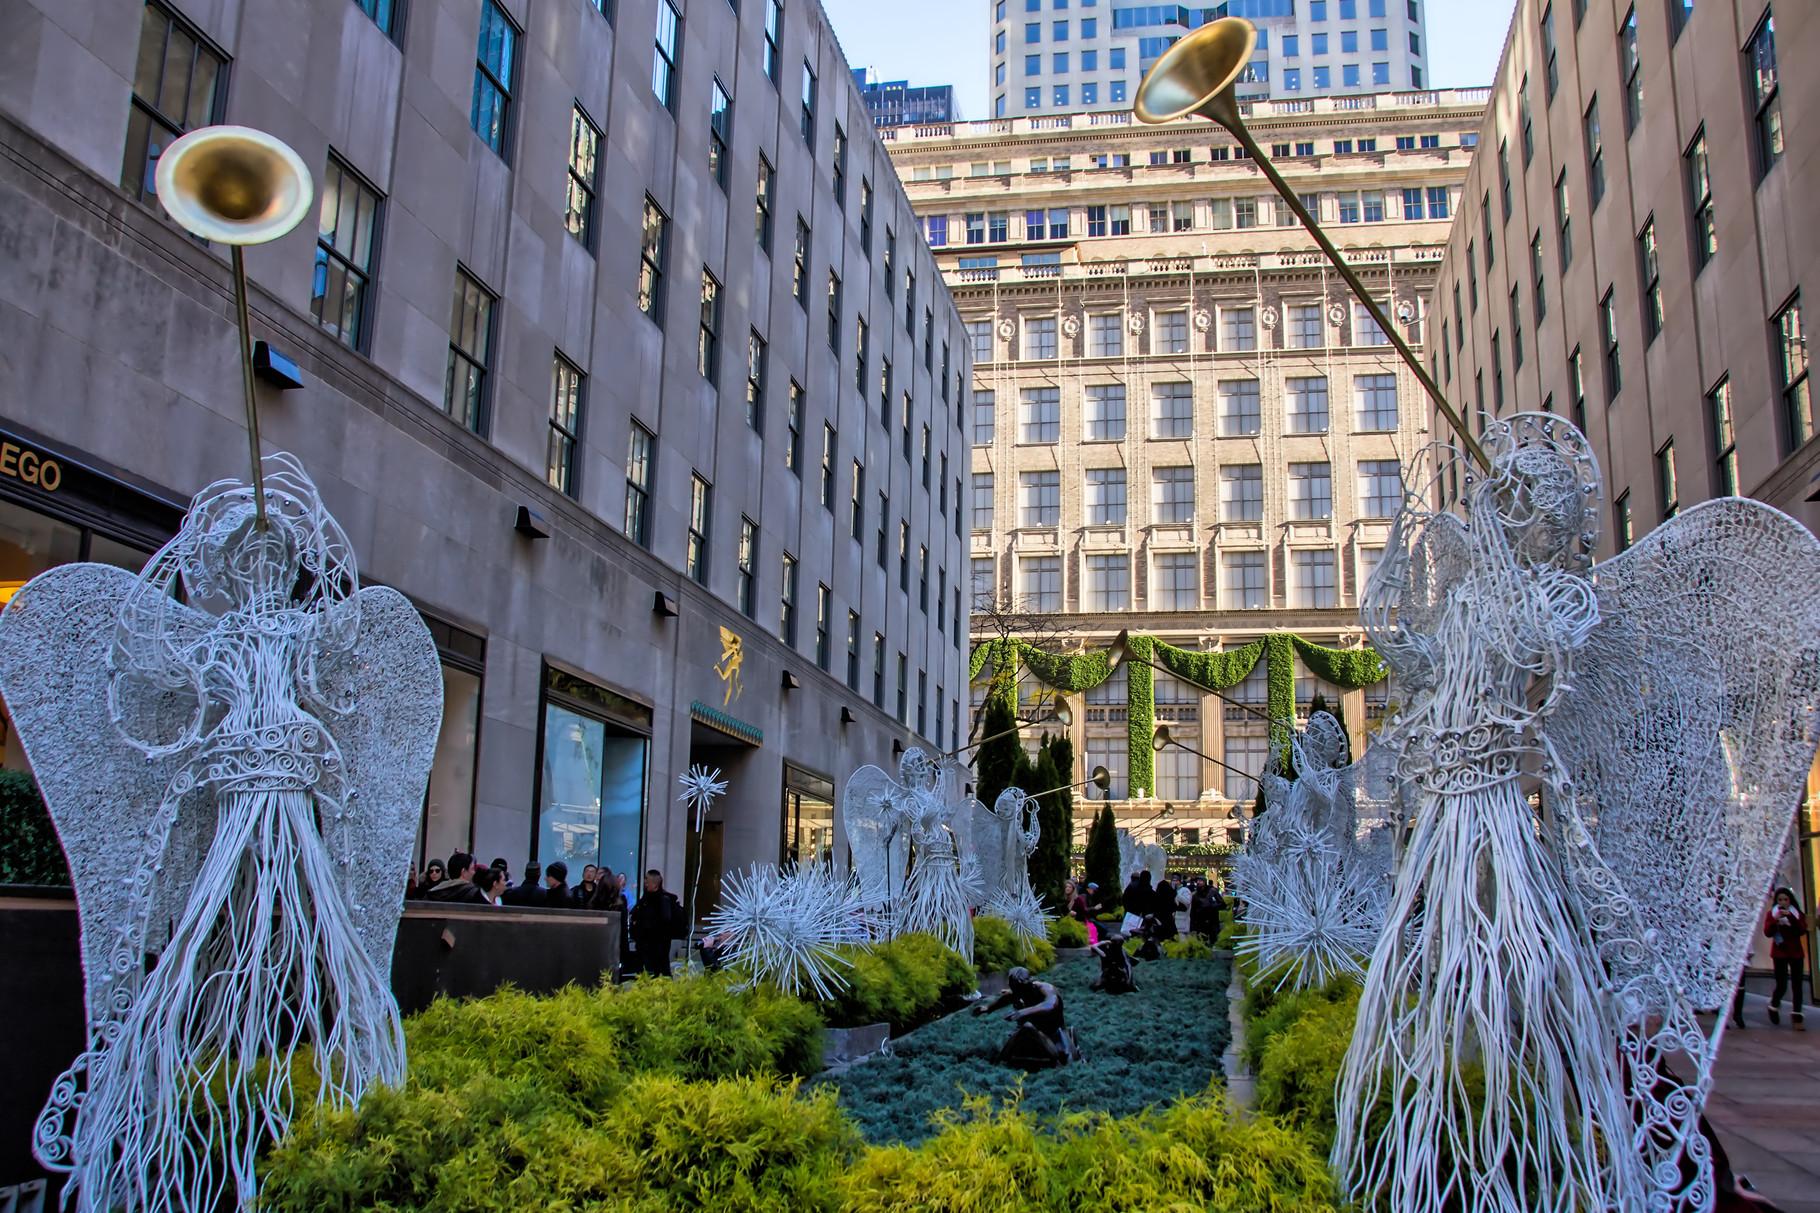 09_NYC Rockefeller Center.